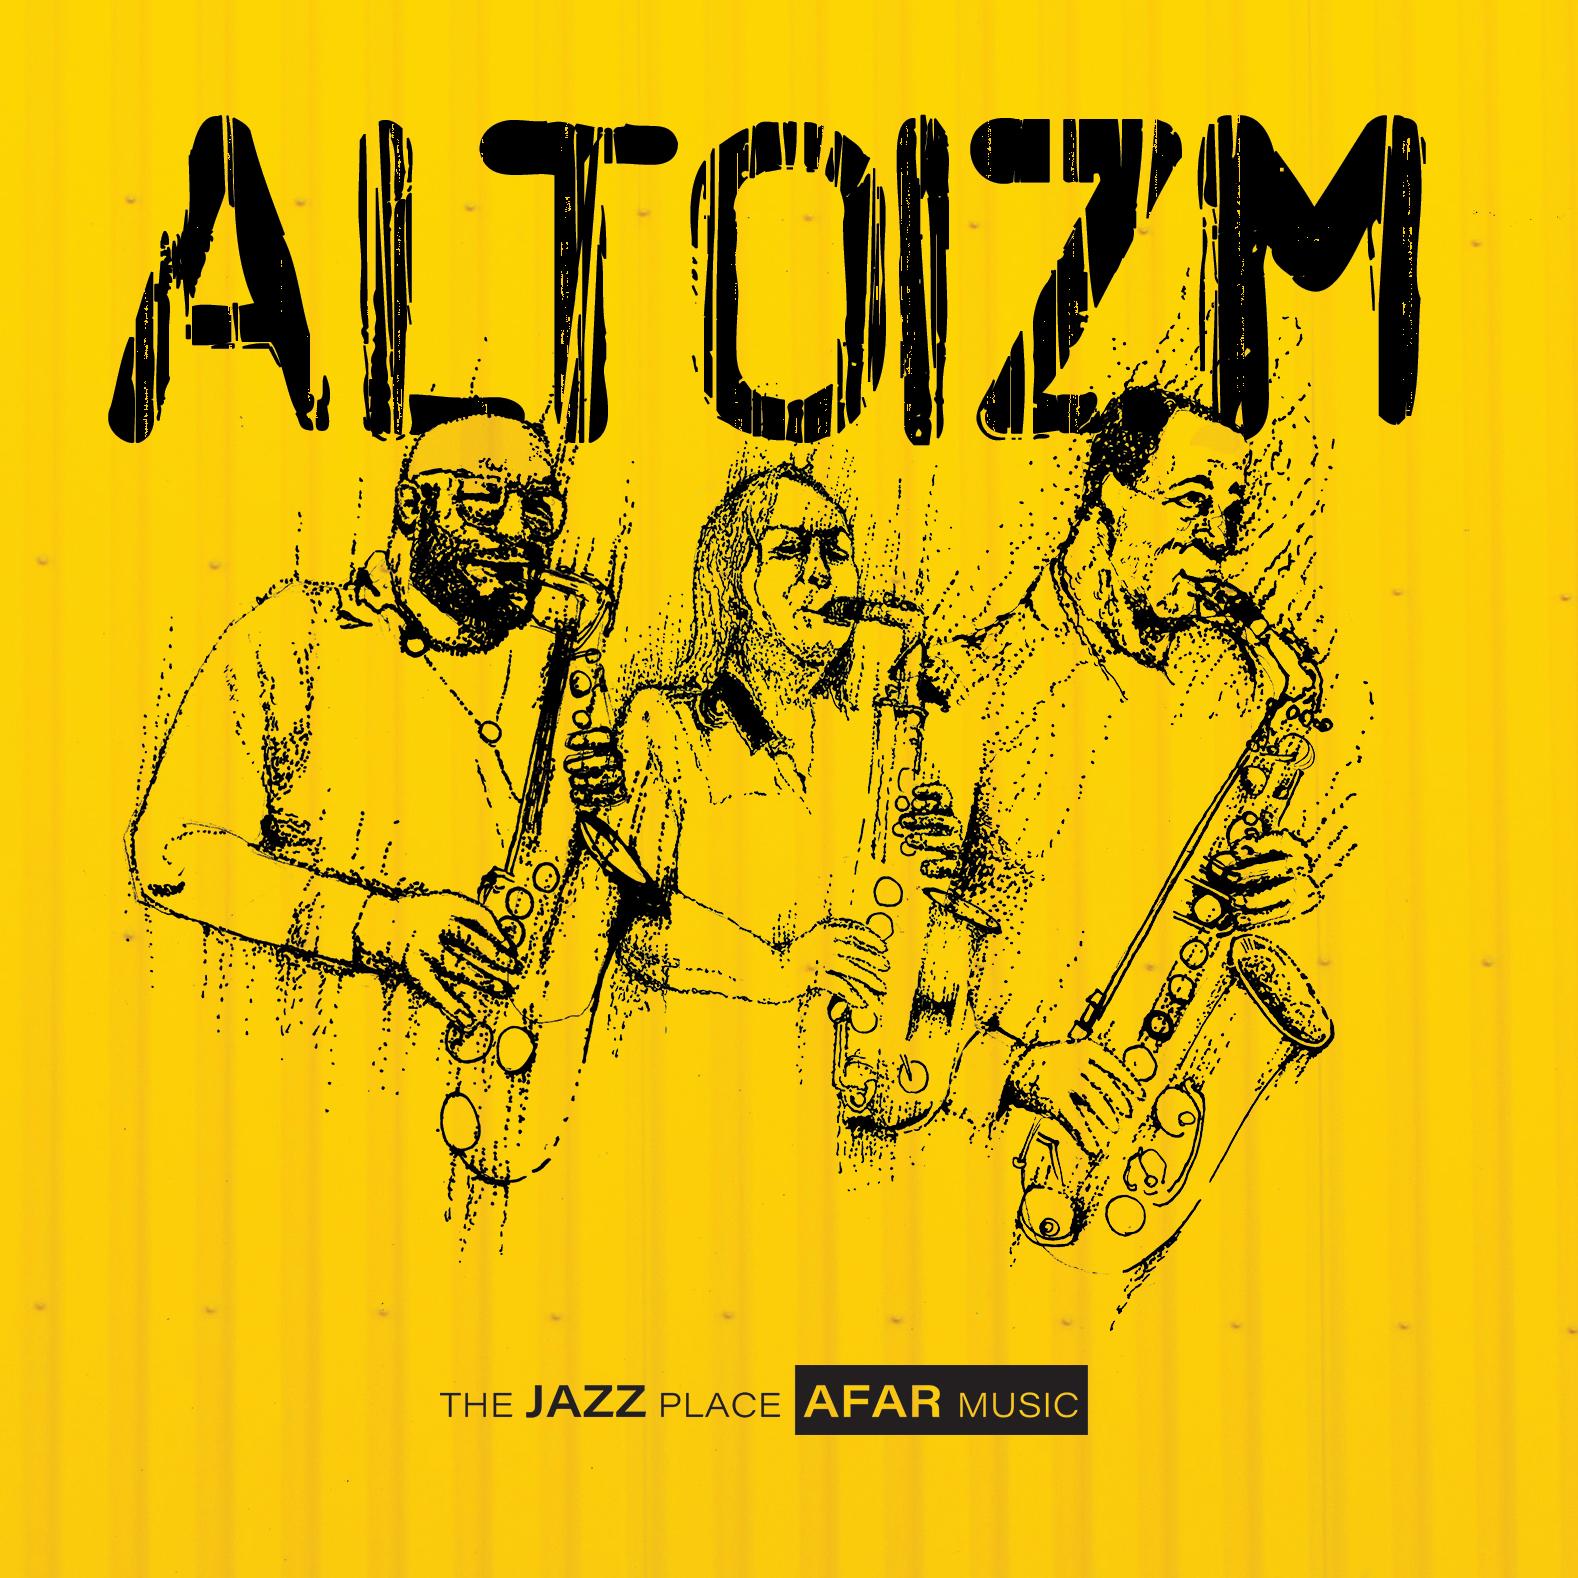 NEW RELEASE: Saxophone Supergoup 'Altoizm', f/ Greg Ward, Rajiv Halim, Sharel  Cassity to Release Self-Titled Debut on July 16, 2021 via AFAR Music -  LYDIALIEBMAN.COM